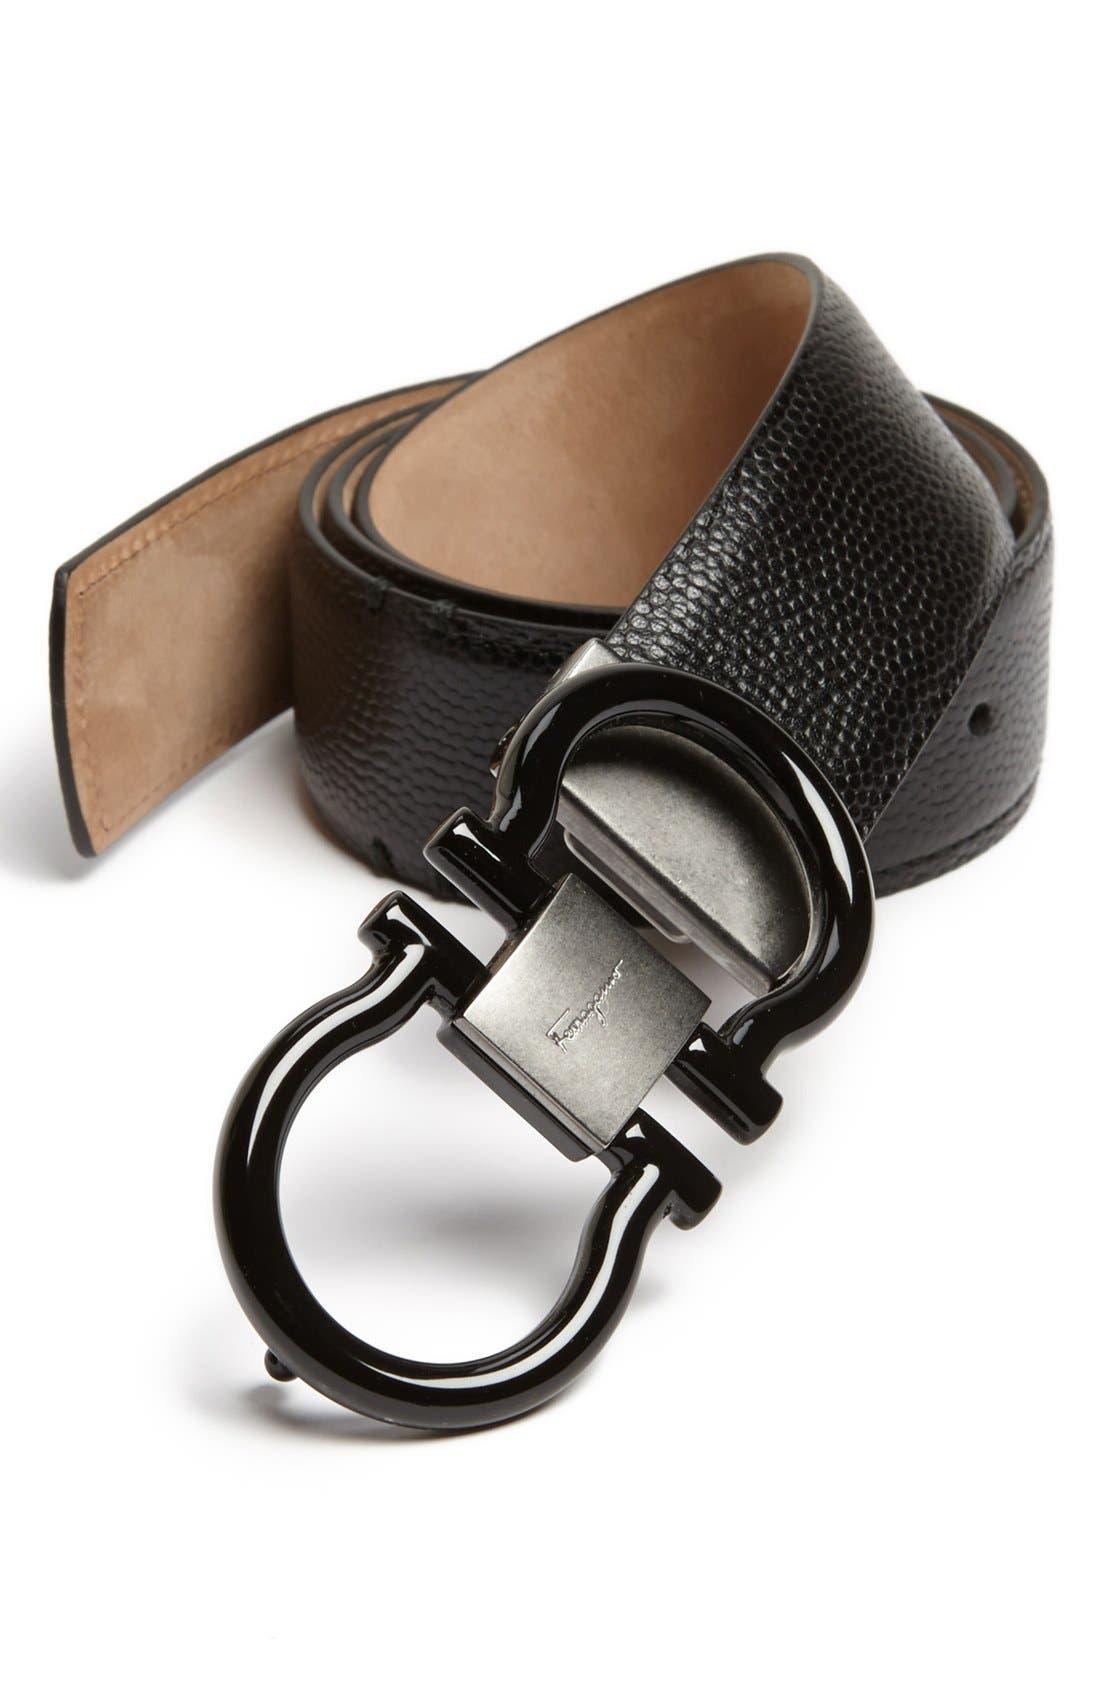 Alternate Image 1 Selected - Salvatore Ferragamo Calfskin Leather Belt